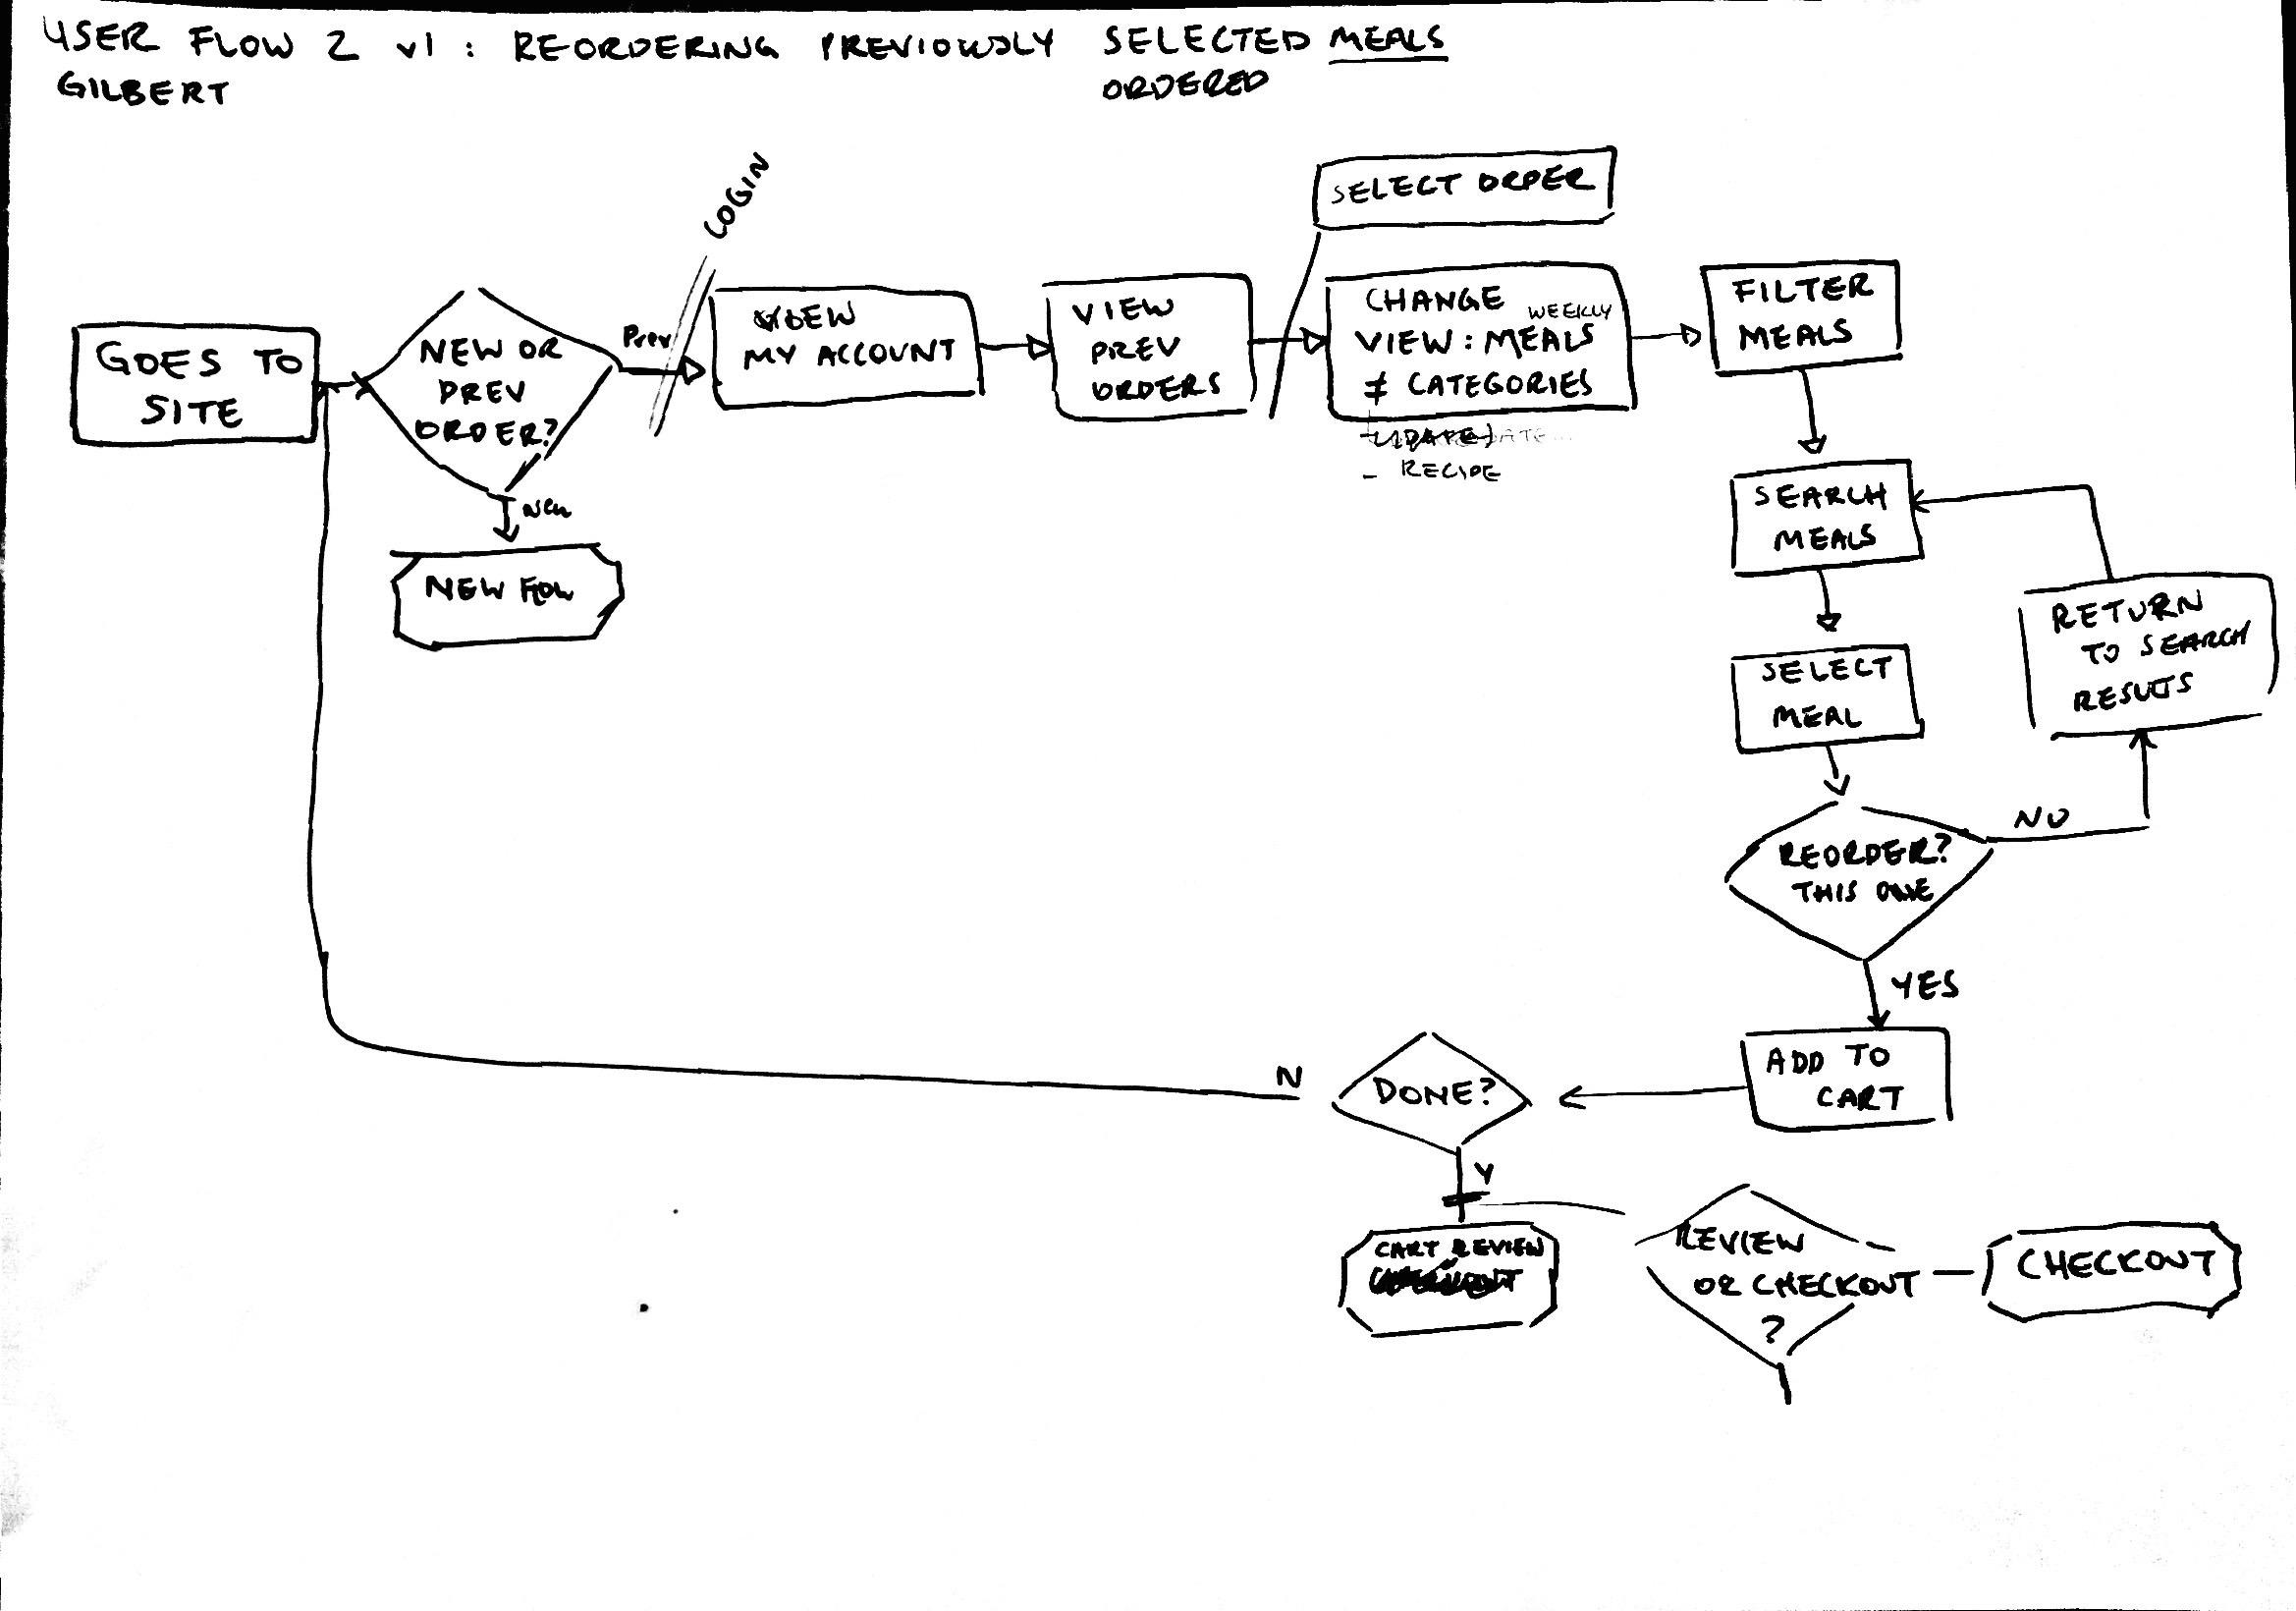 Draft user flow